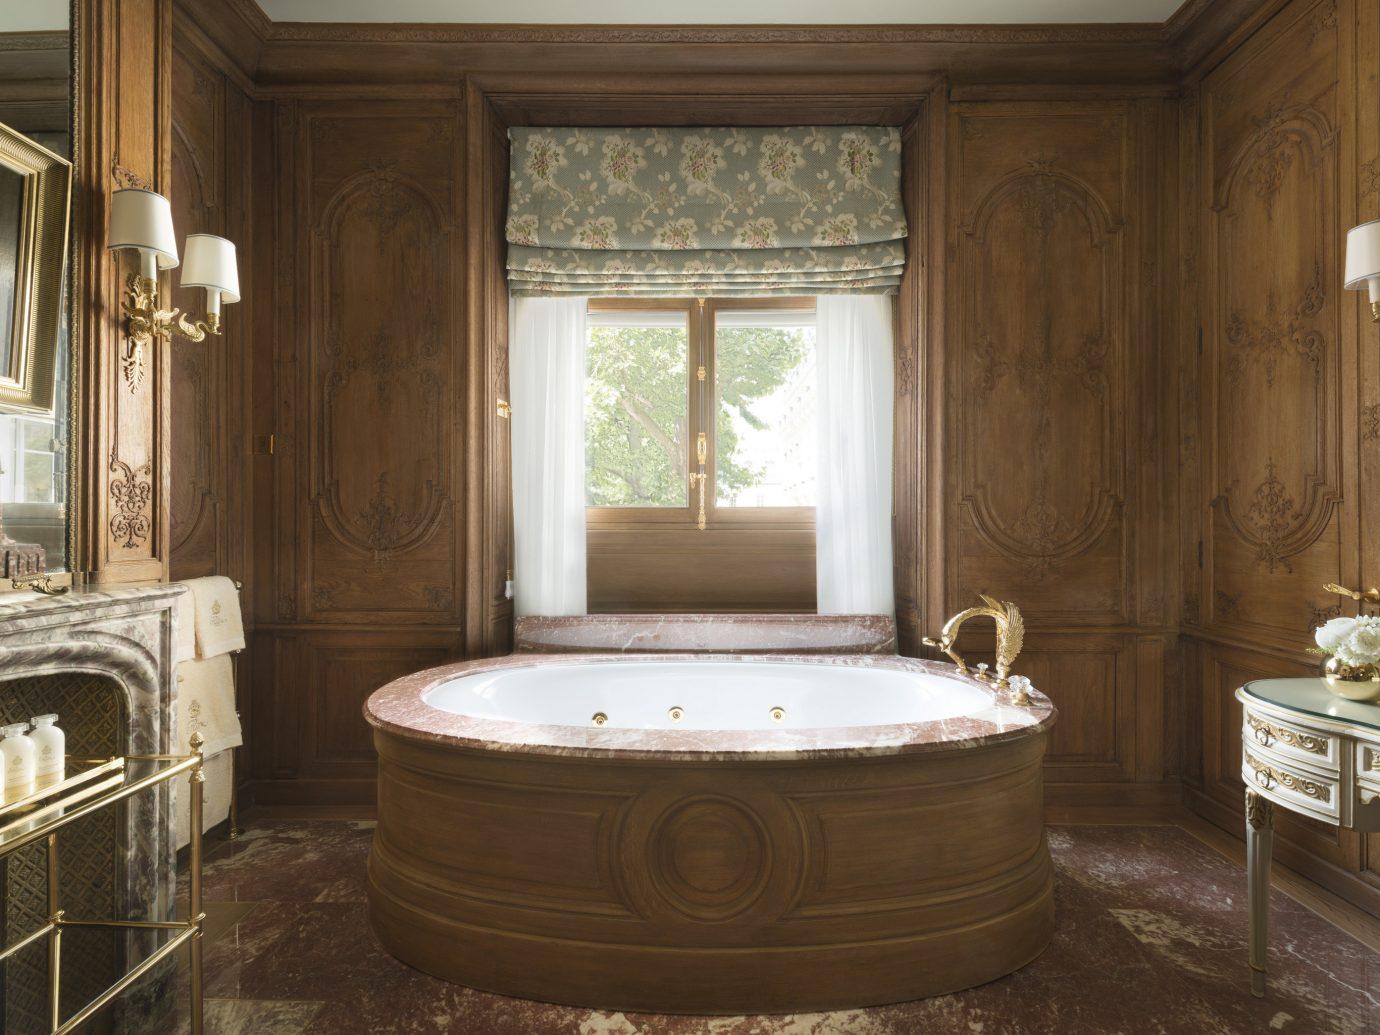 Hotels Luxury Travel indoor window room bathroom interior design estate bathtub flooring floor tub Suite Bath old stone